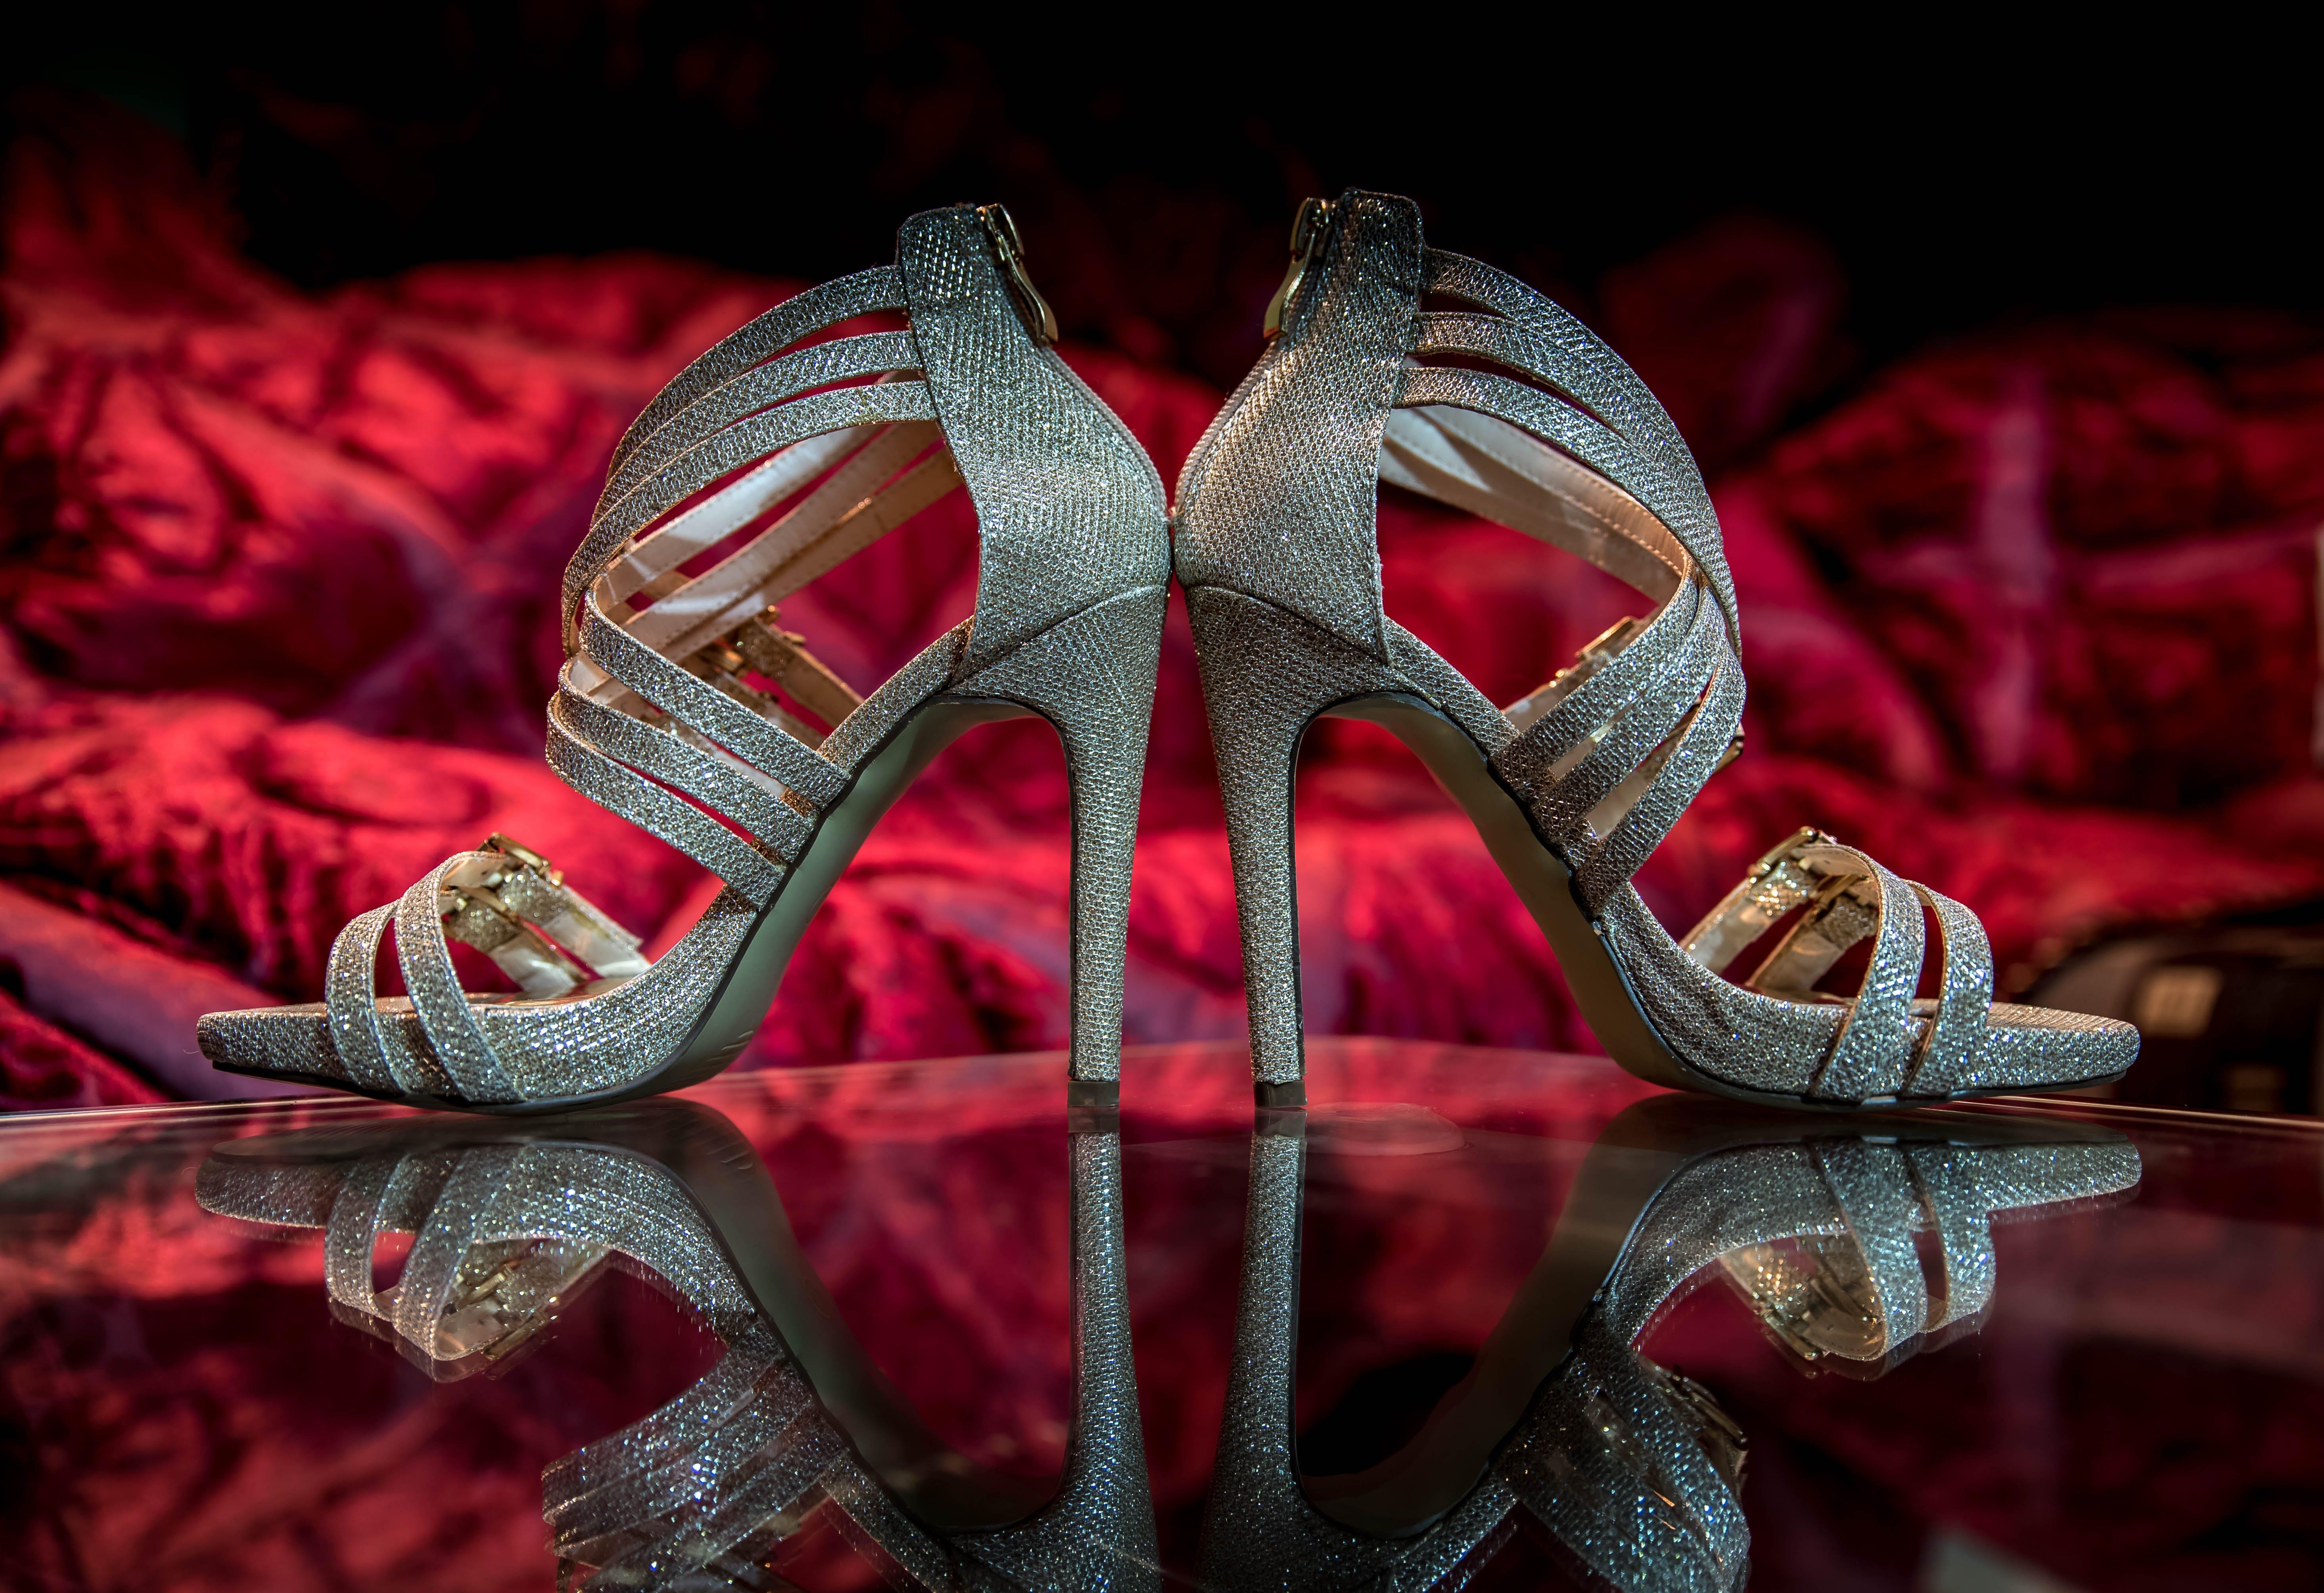 Pair of Silver Open-toe Heeled Sandals on Floor